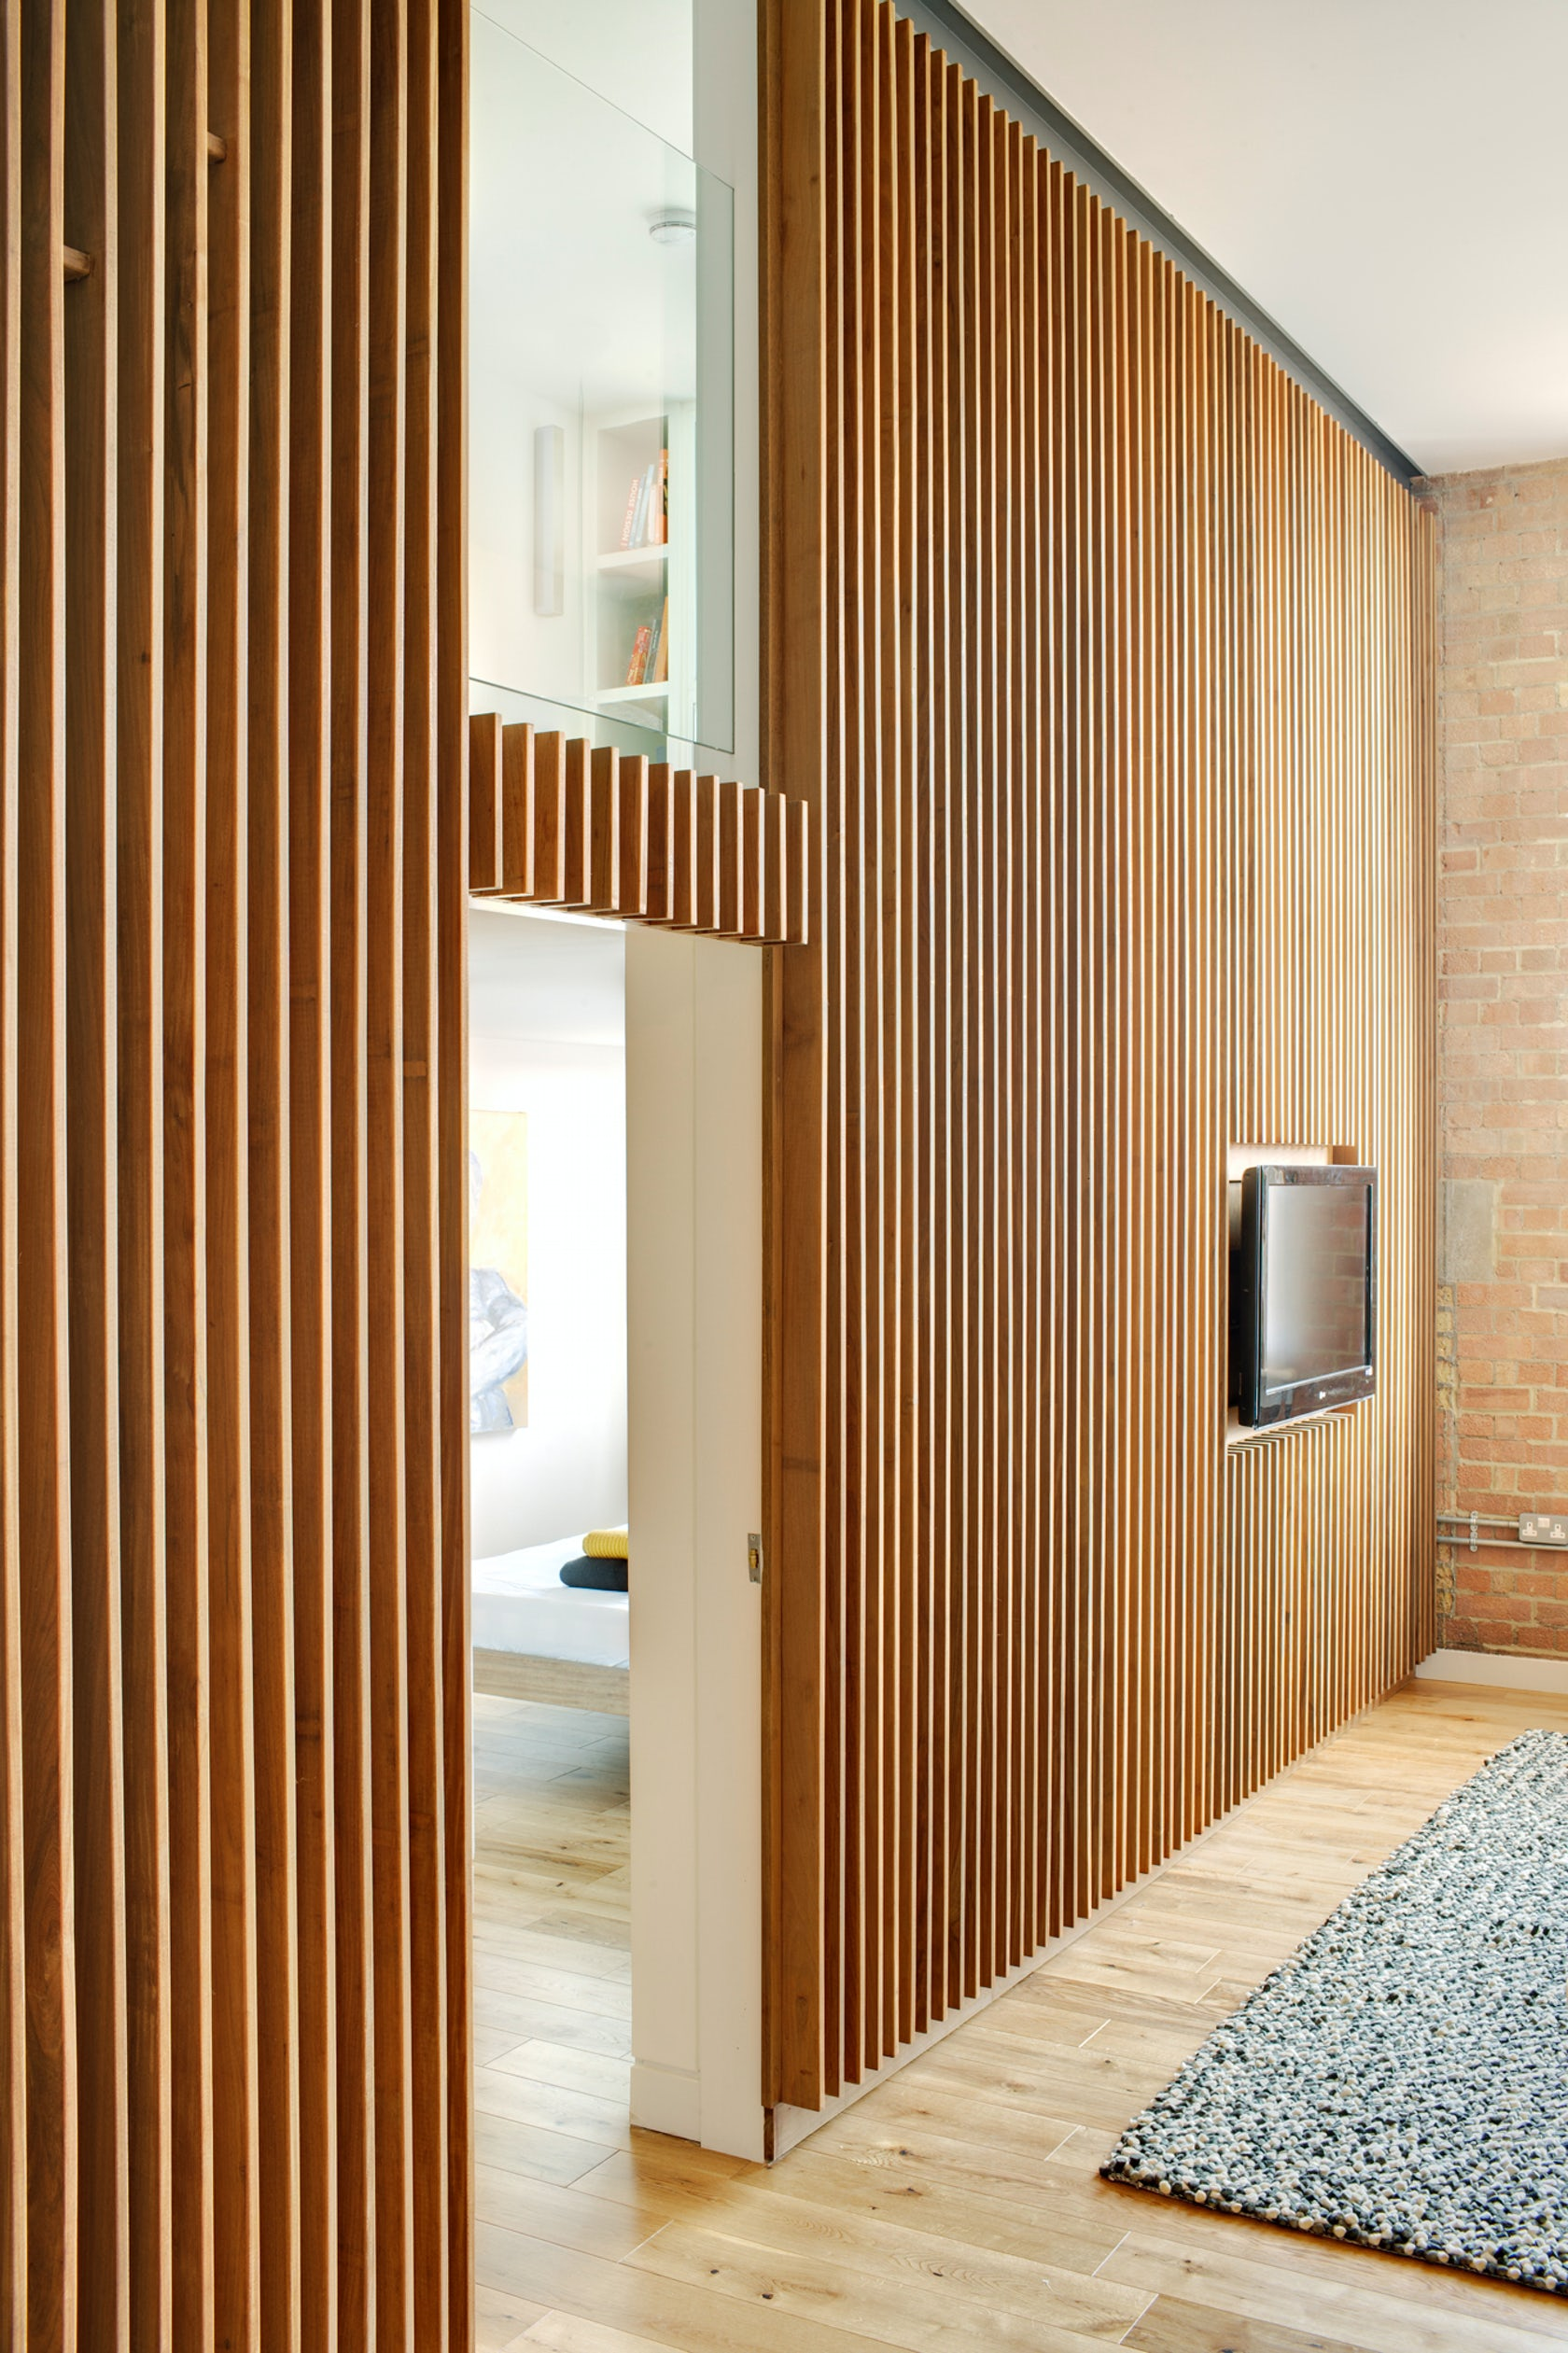 apartment in bow quarter london architizer. Black Bedroom Furniture Sets. Home Design Ideas